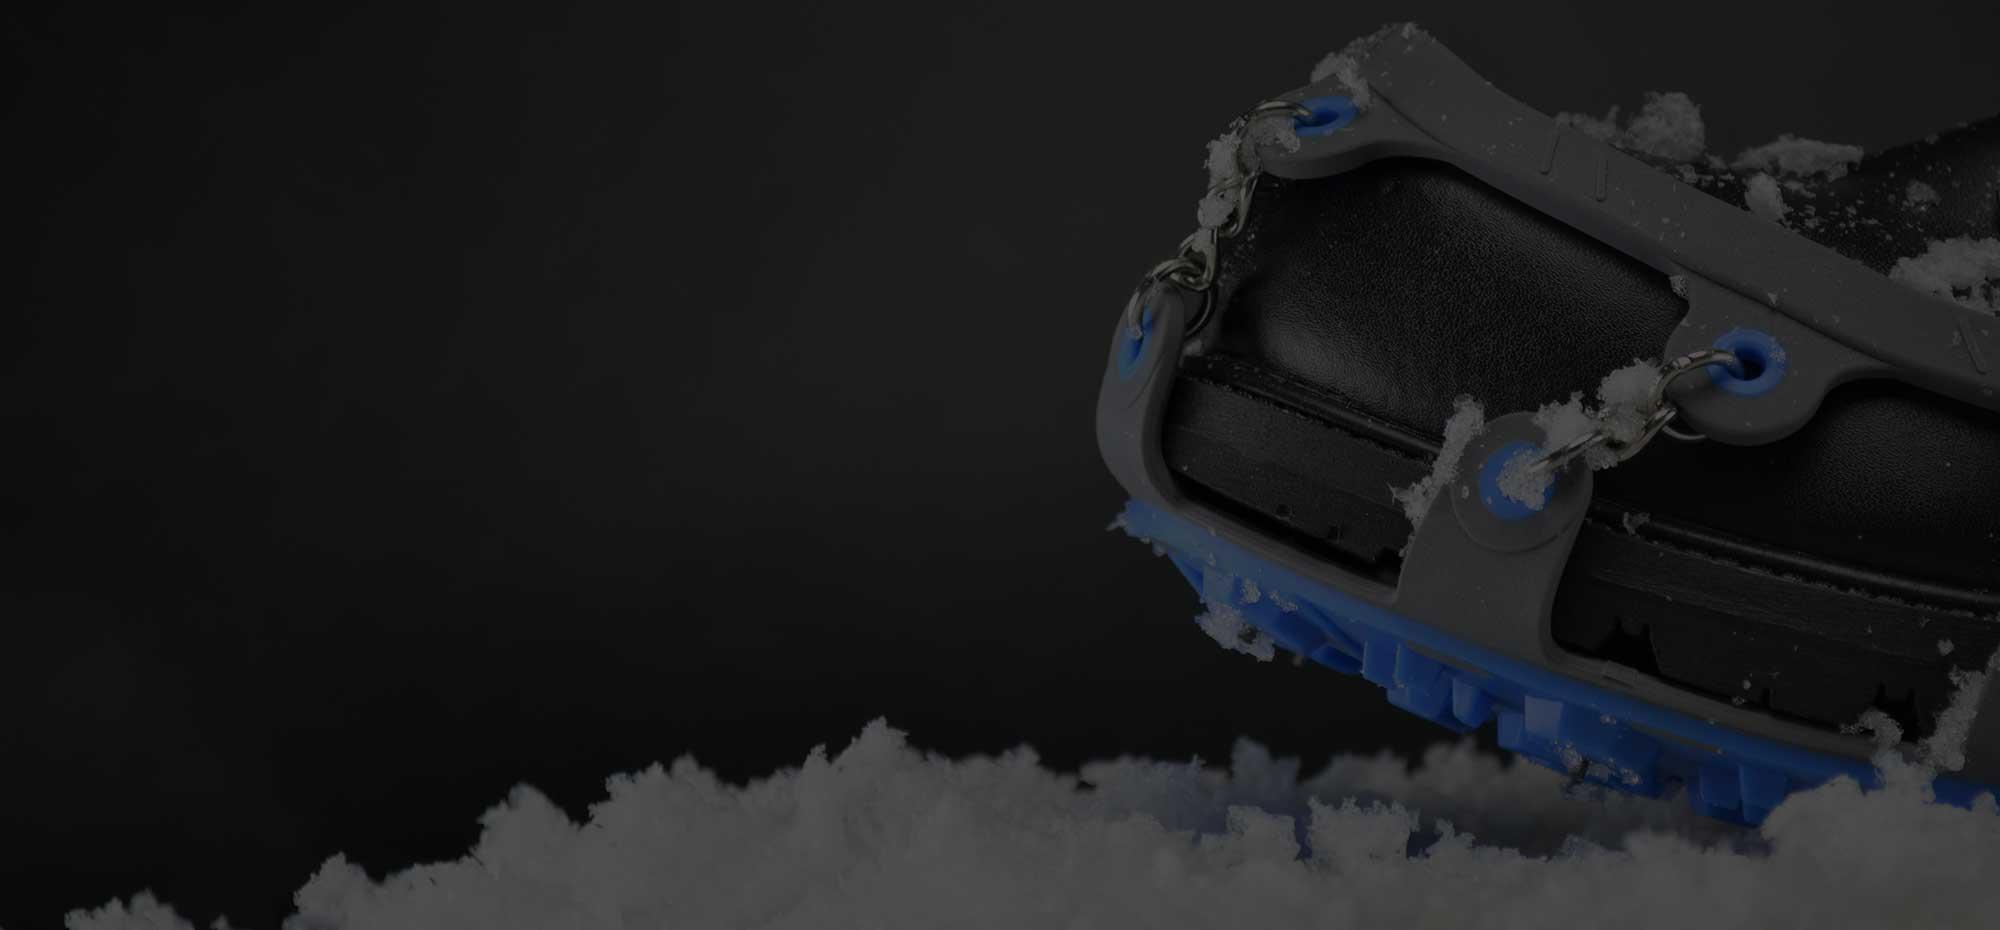 Ice Beast Ice Cleats